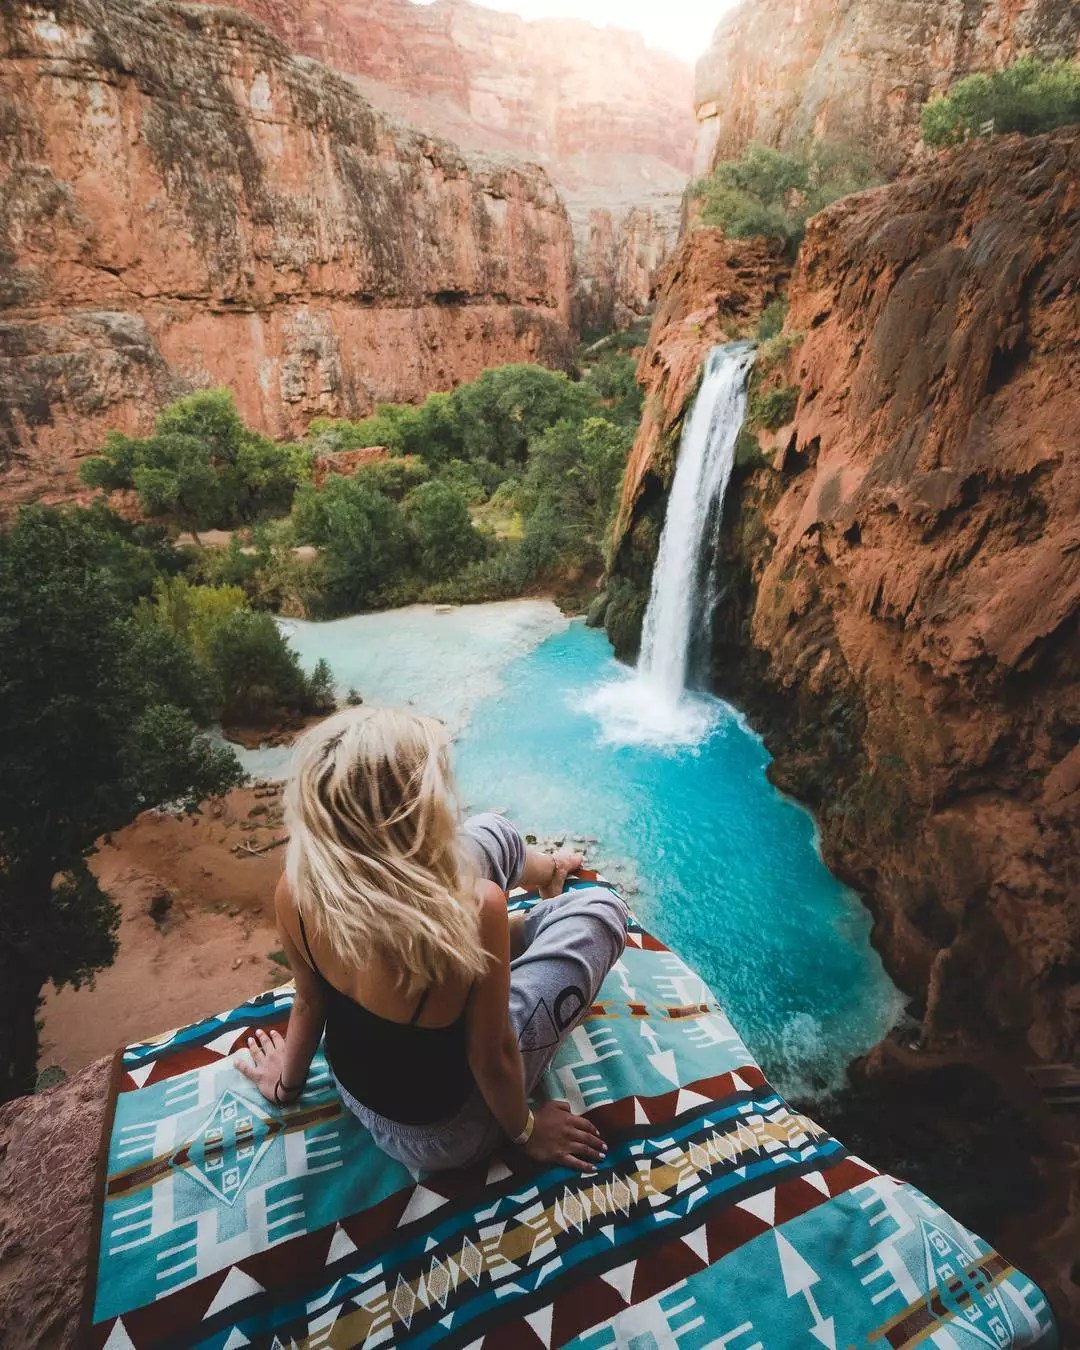 Woman sitting on cliff in Havasupai. Photo by Instagram user @braybraywoowoo